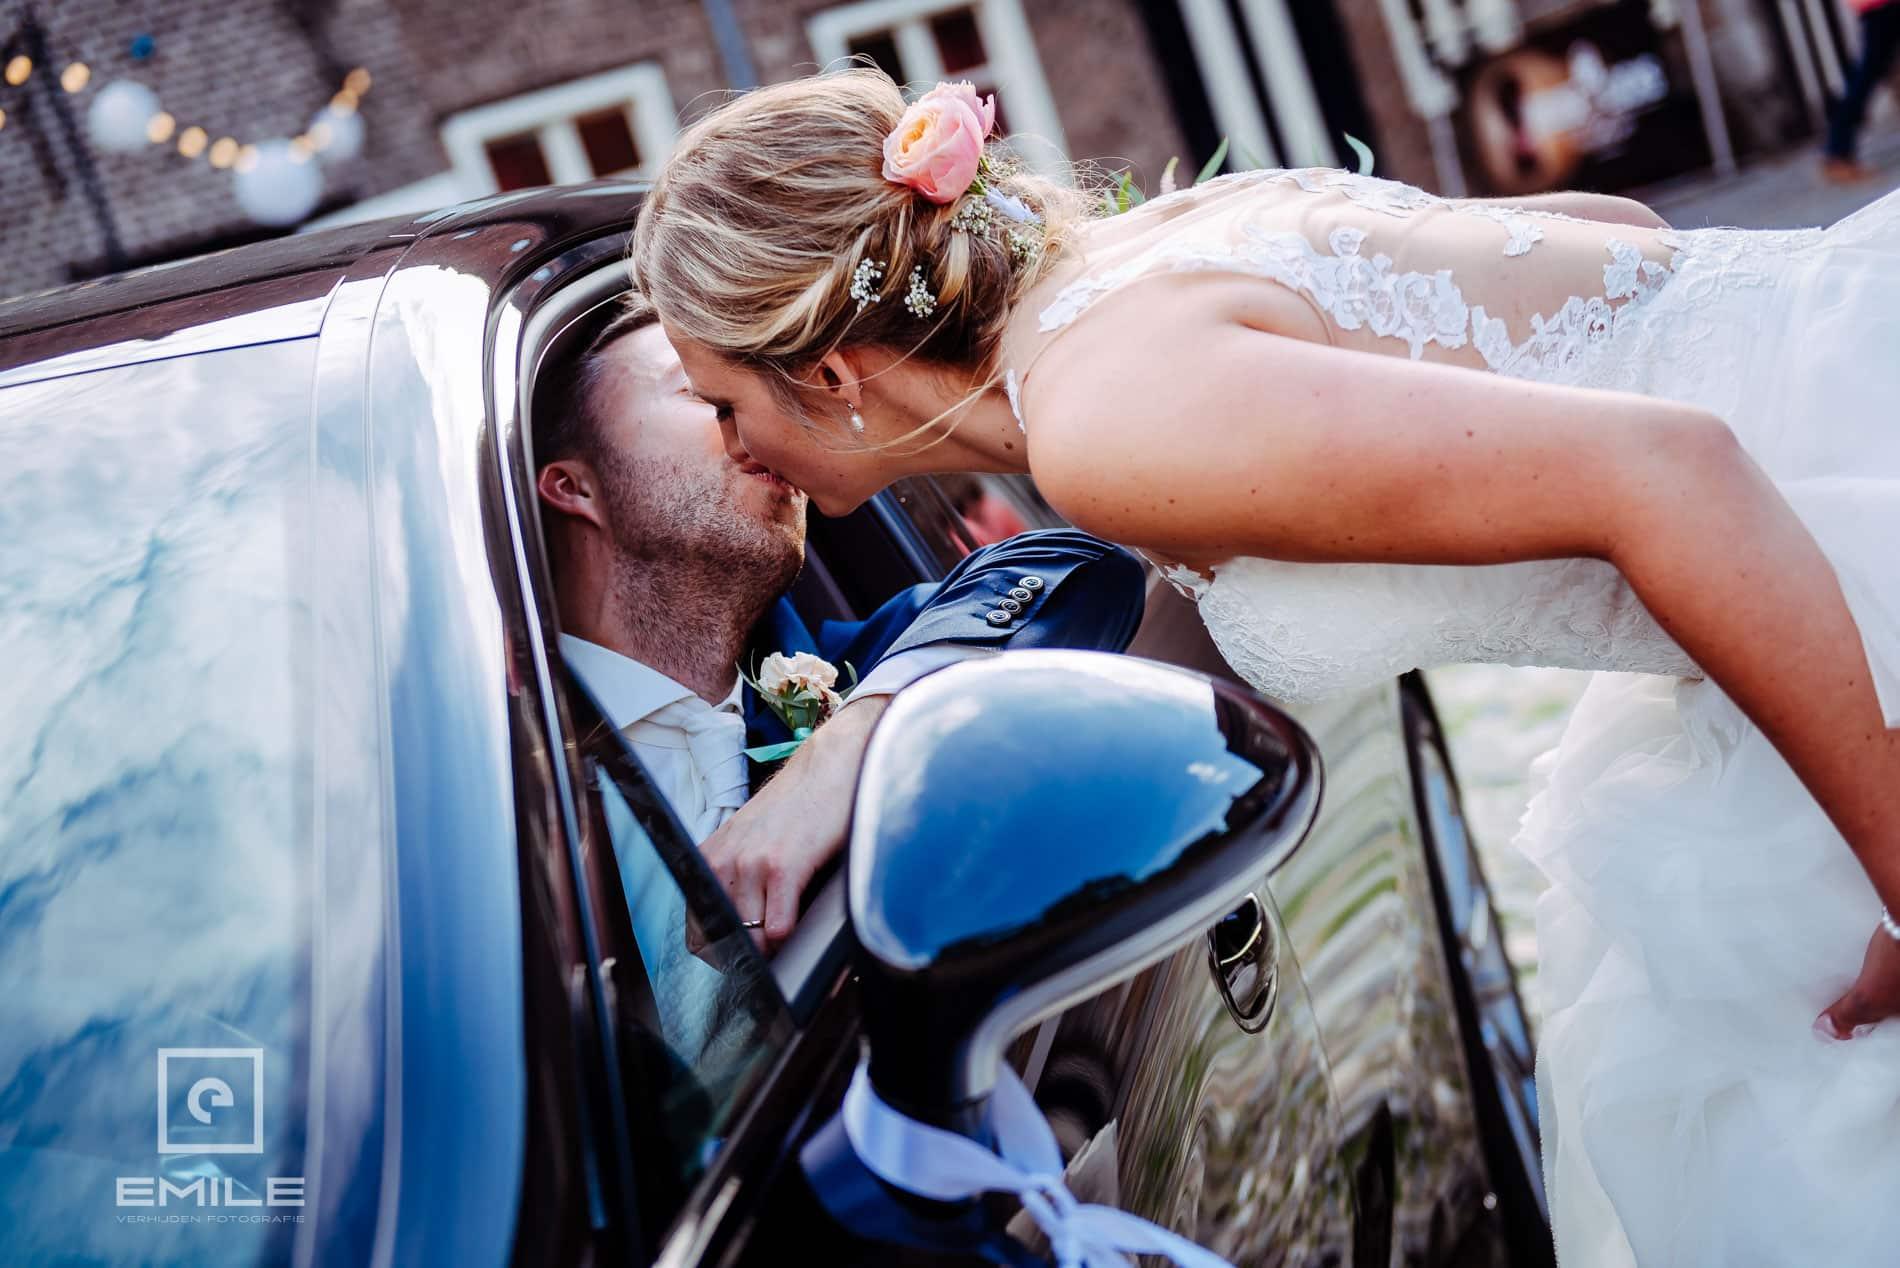 Huwelijksfotograaf Kasteel Limbricht -  kus bij bruidsauto